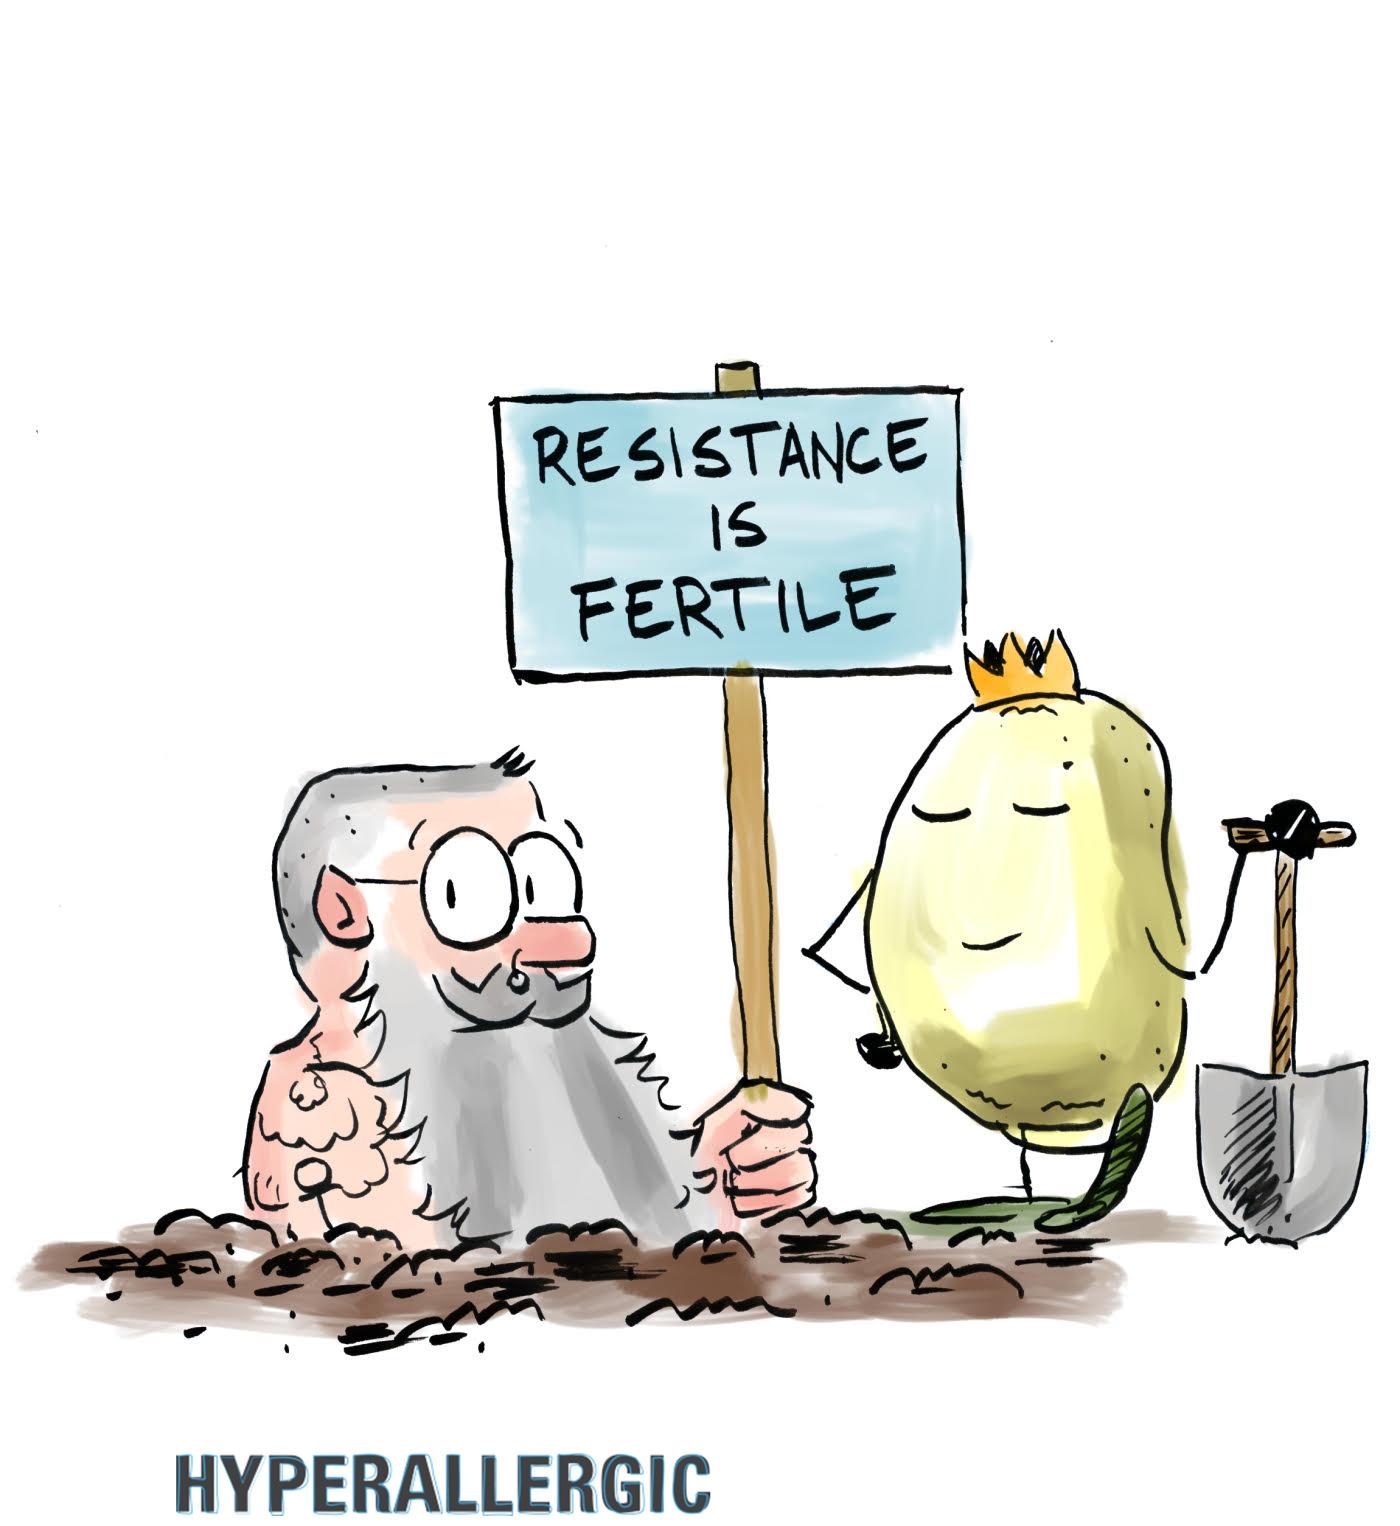 resistancefertile-1400